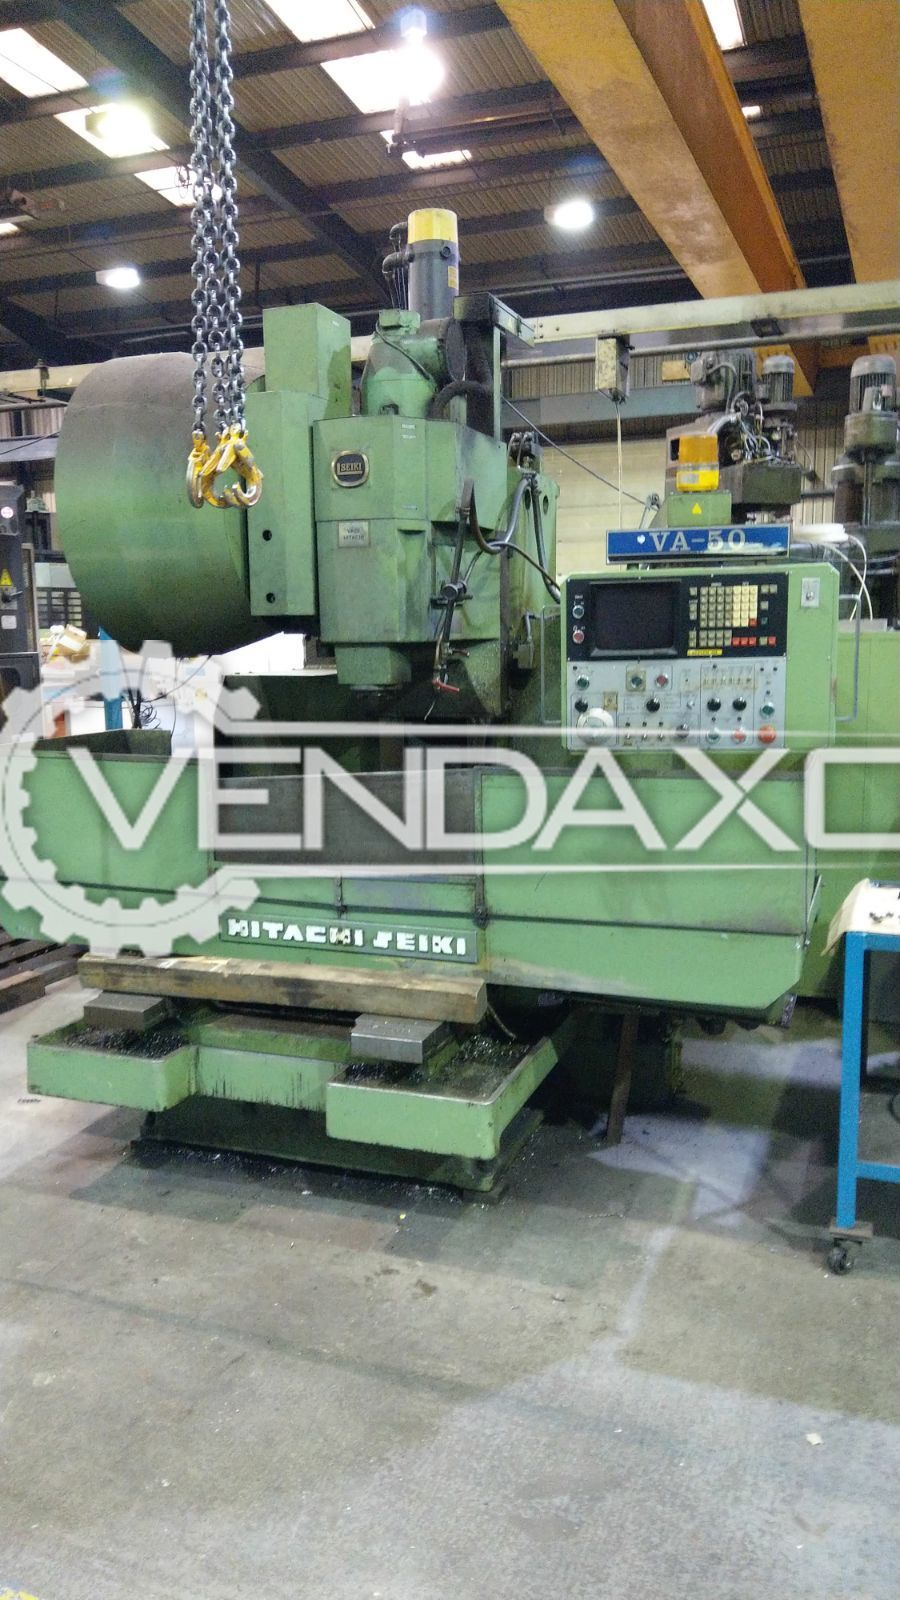 Hitachi Seiki VA50 CNC Vertical Machining Center